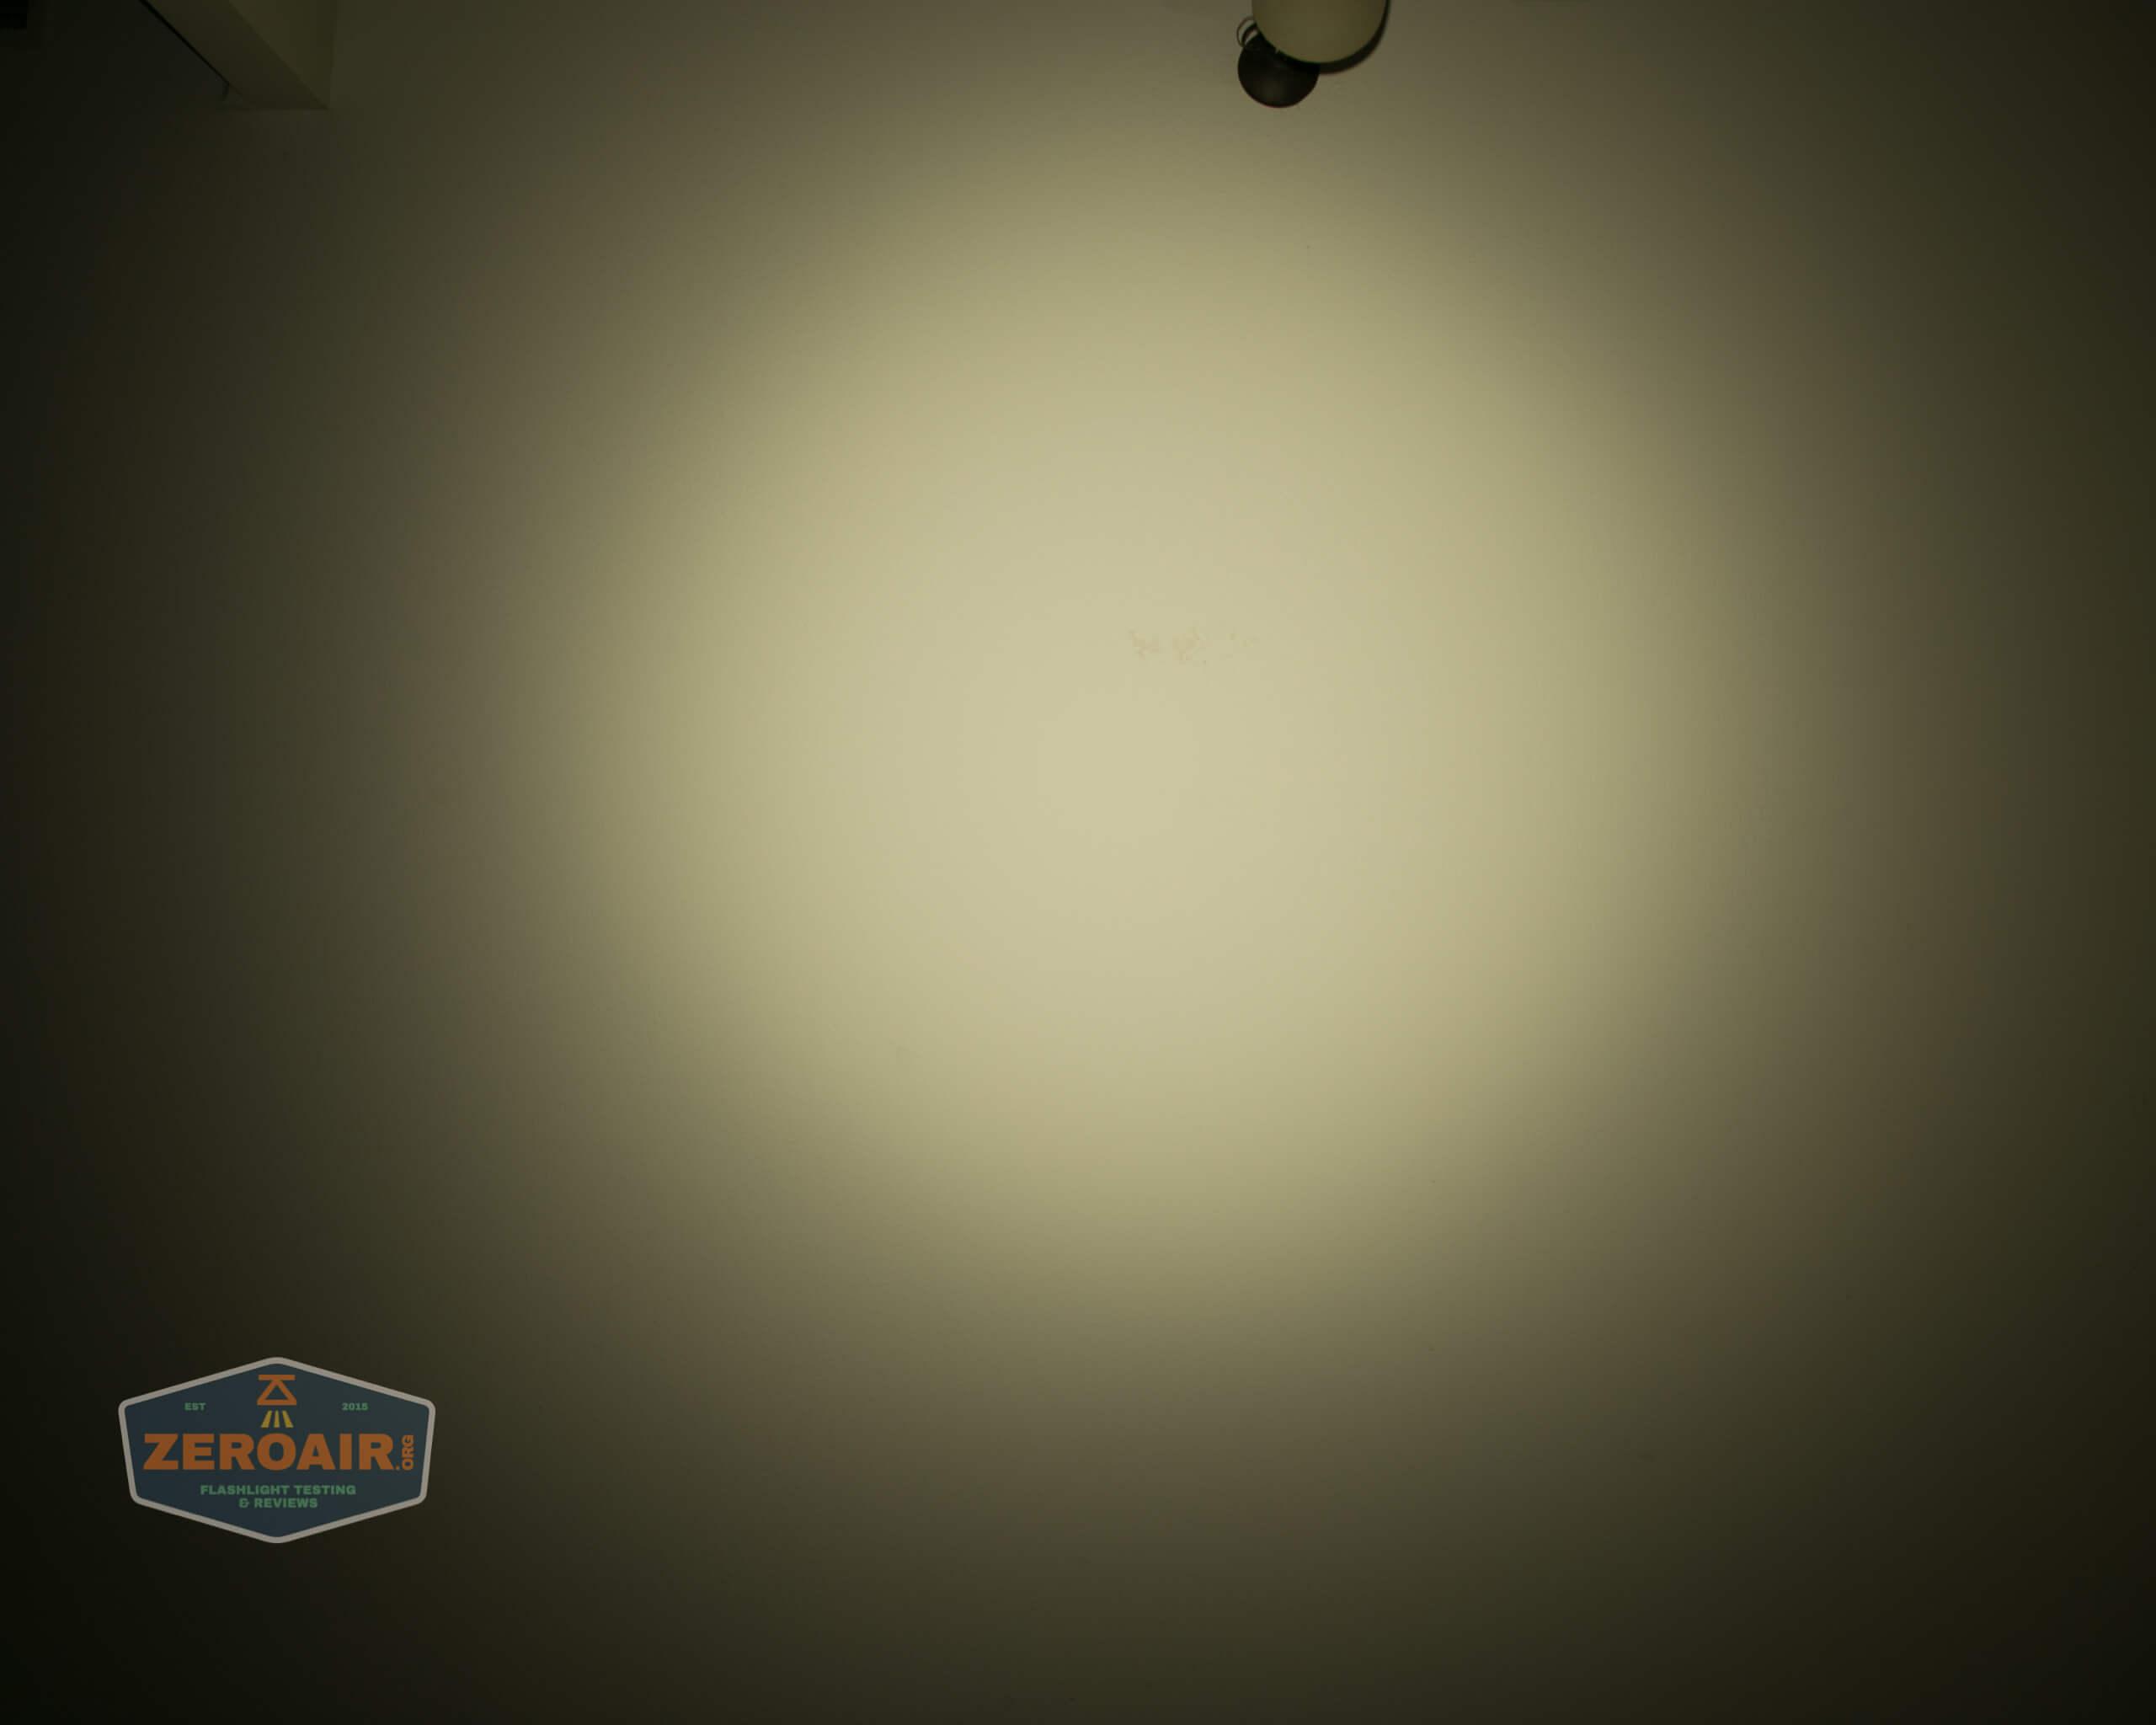 manker e14iii 18650 flood flashlight beamshot ceiling 8